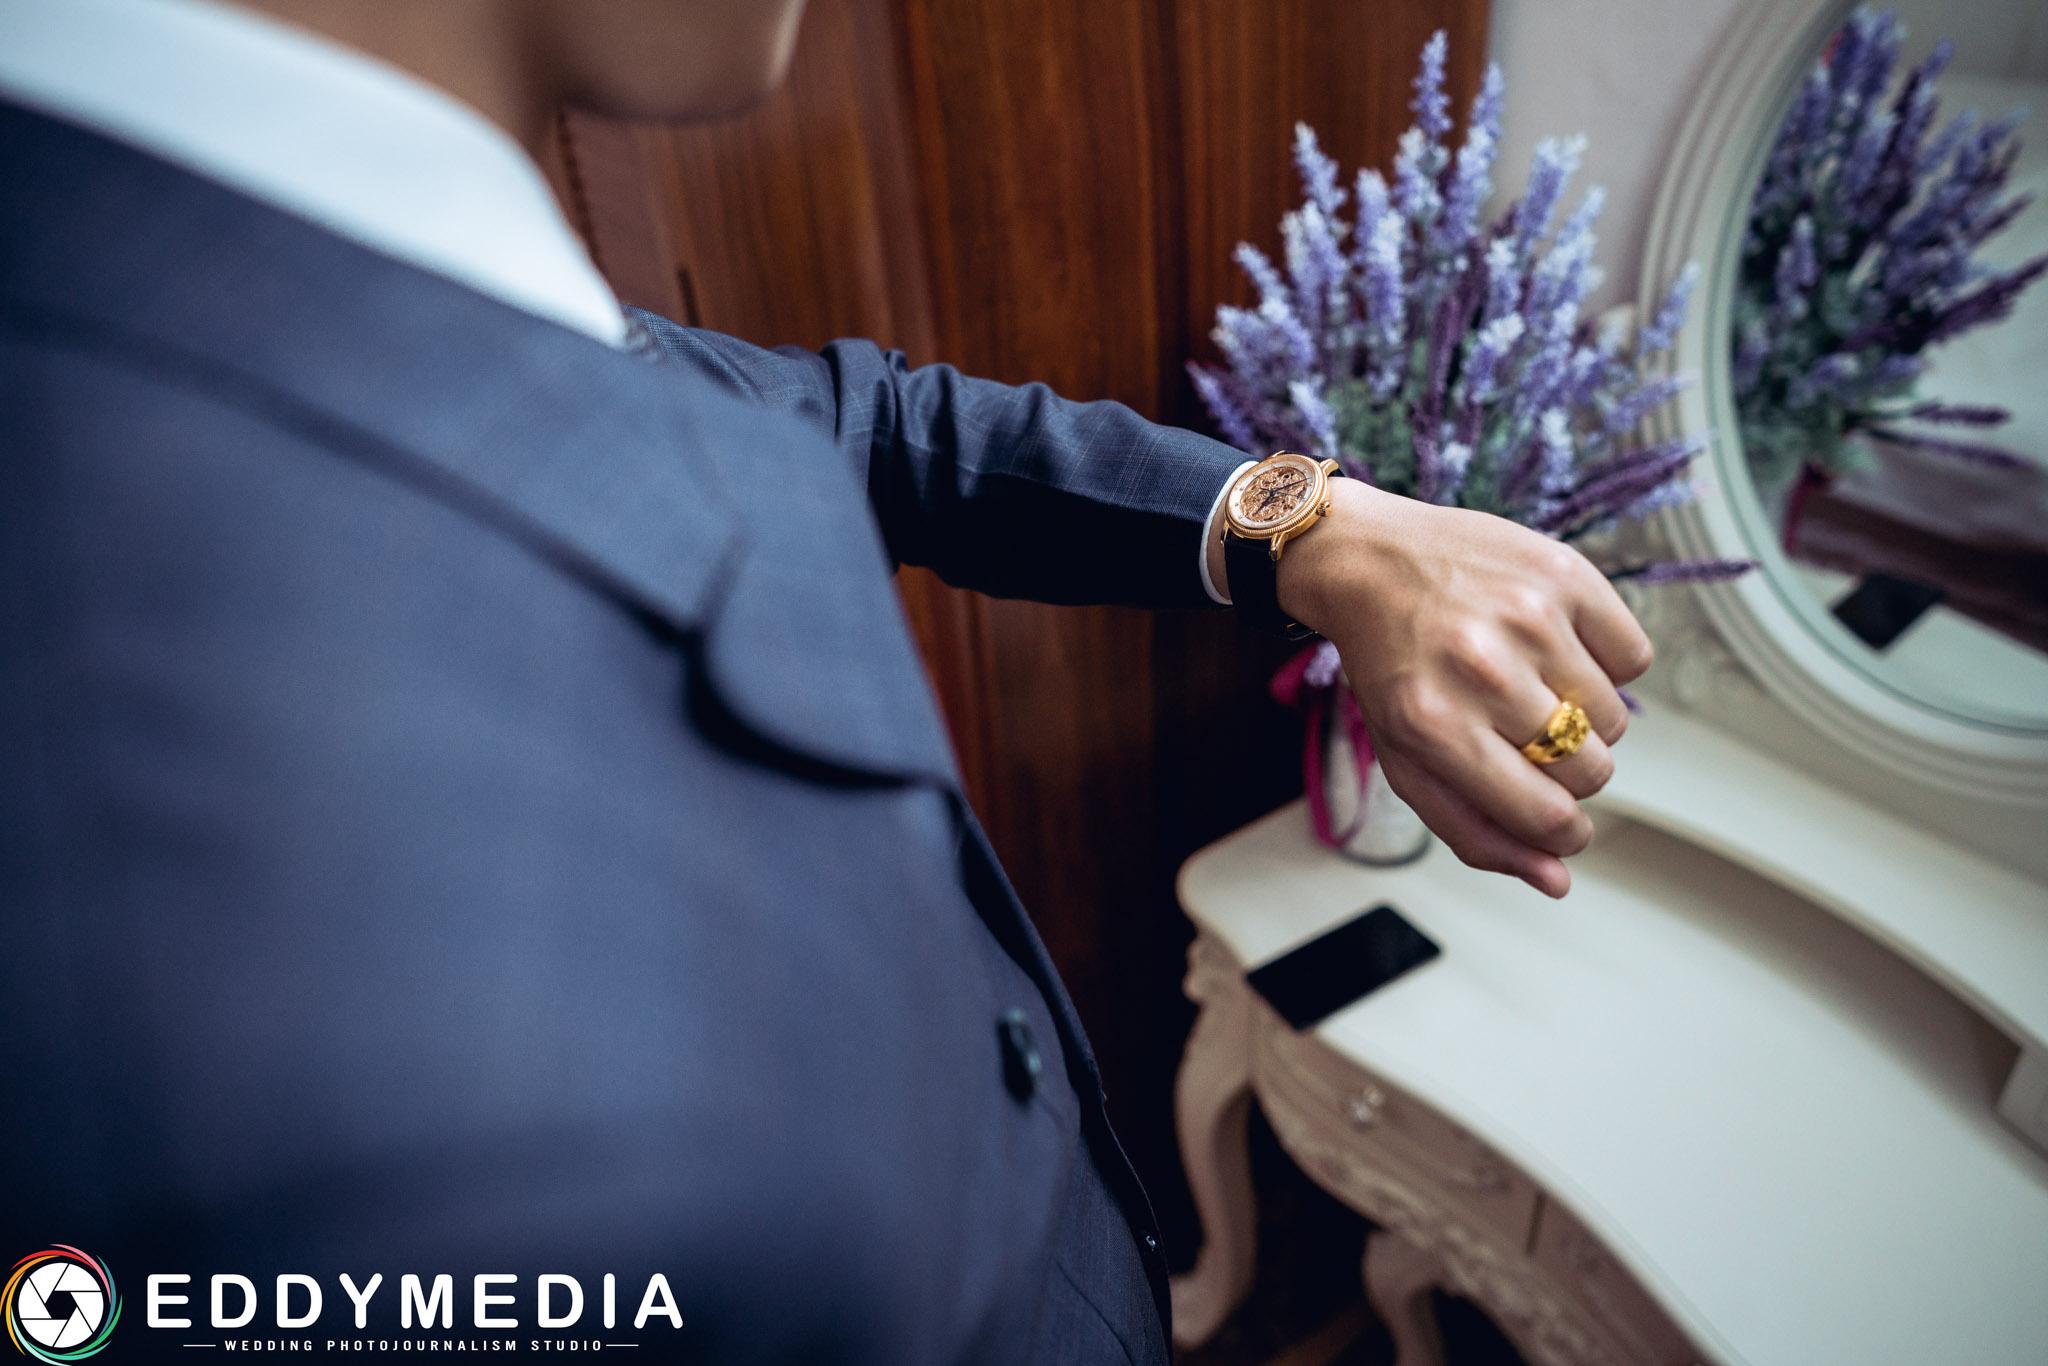 ThanhHai NhatAnh ViHoangNamDinh EddyMedia 40 lấy vợ giàu